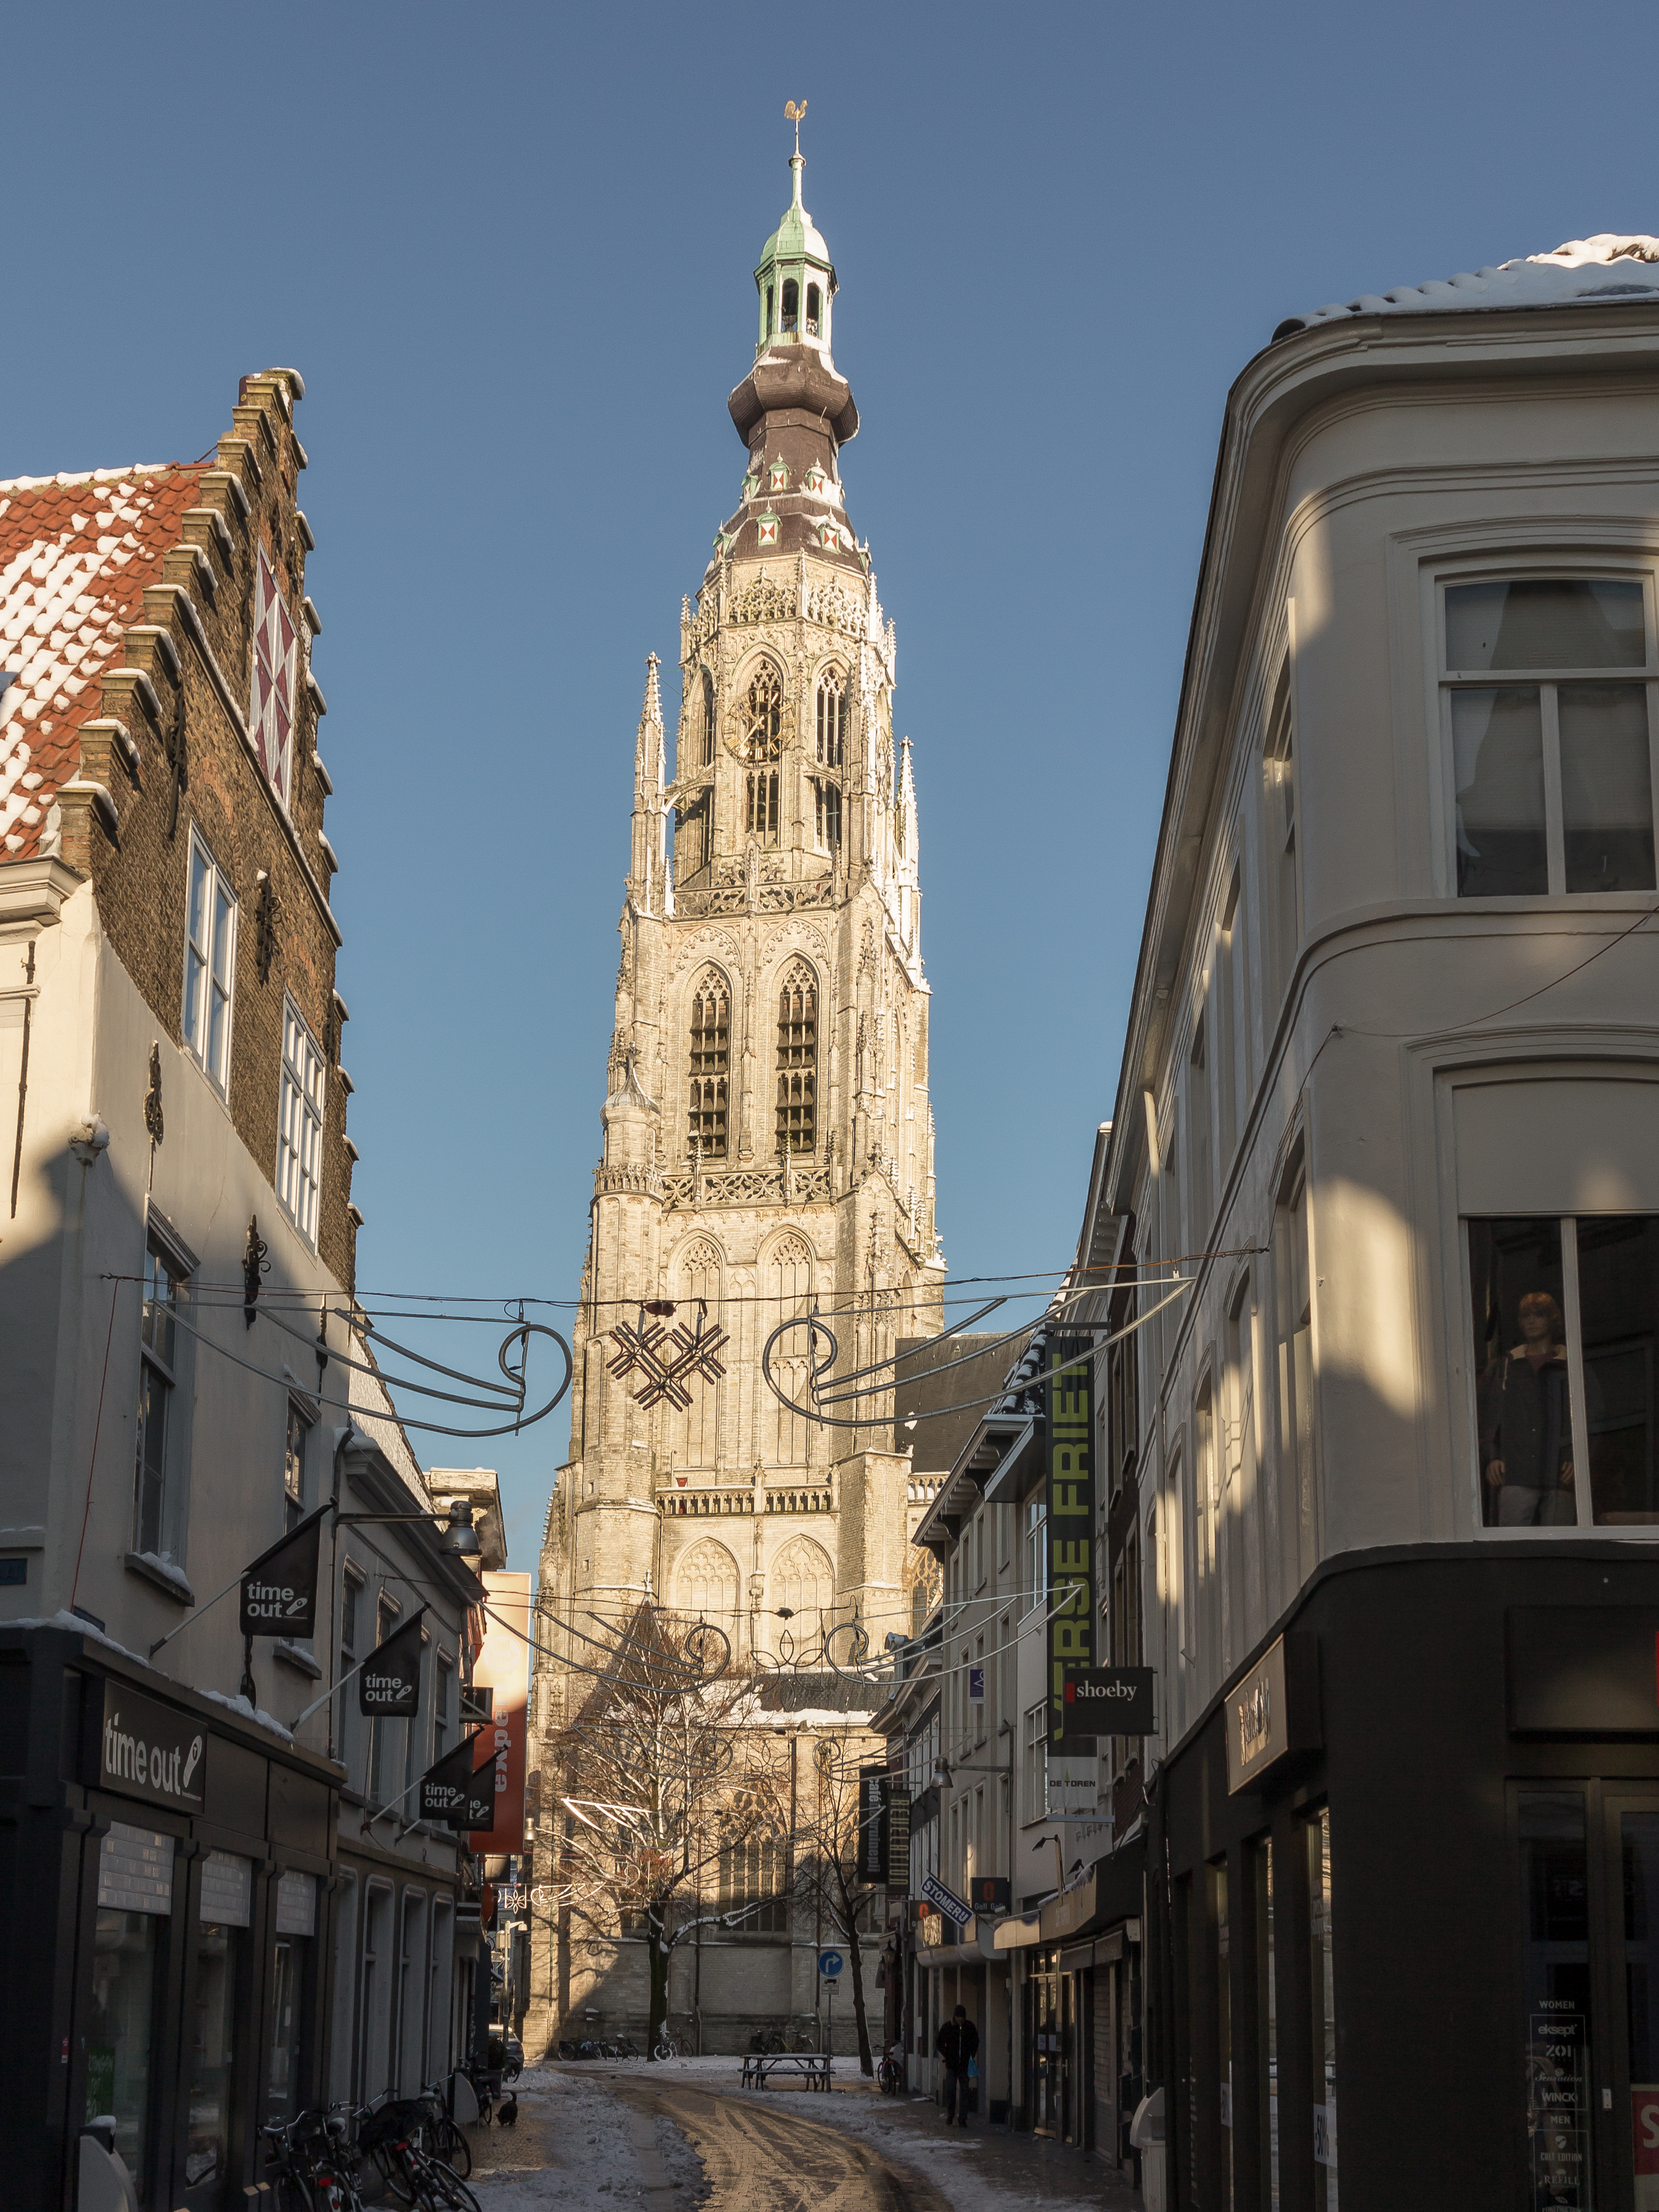 https://upload.wikimedia.org/wikipedia/commons/0/06/Breda%2C_de_Grote_of_Onze_Lieve_Vrouwekerk_RM10305_foto8_2014-12-28_10.30.jpg